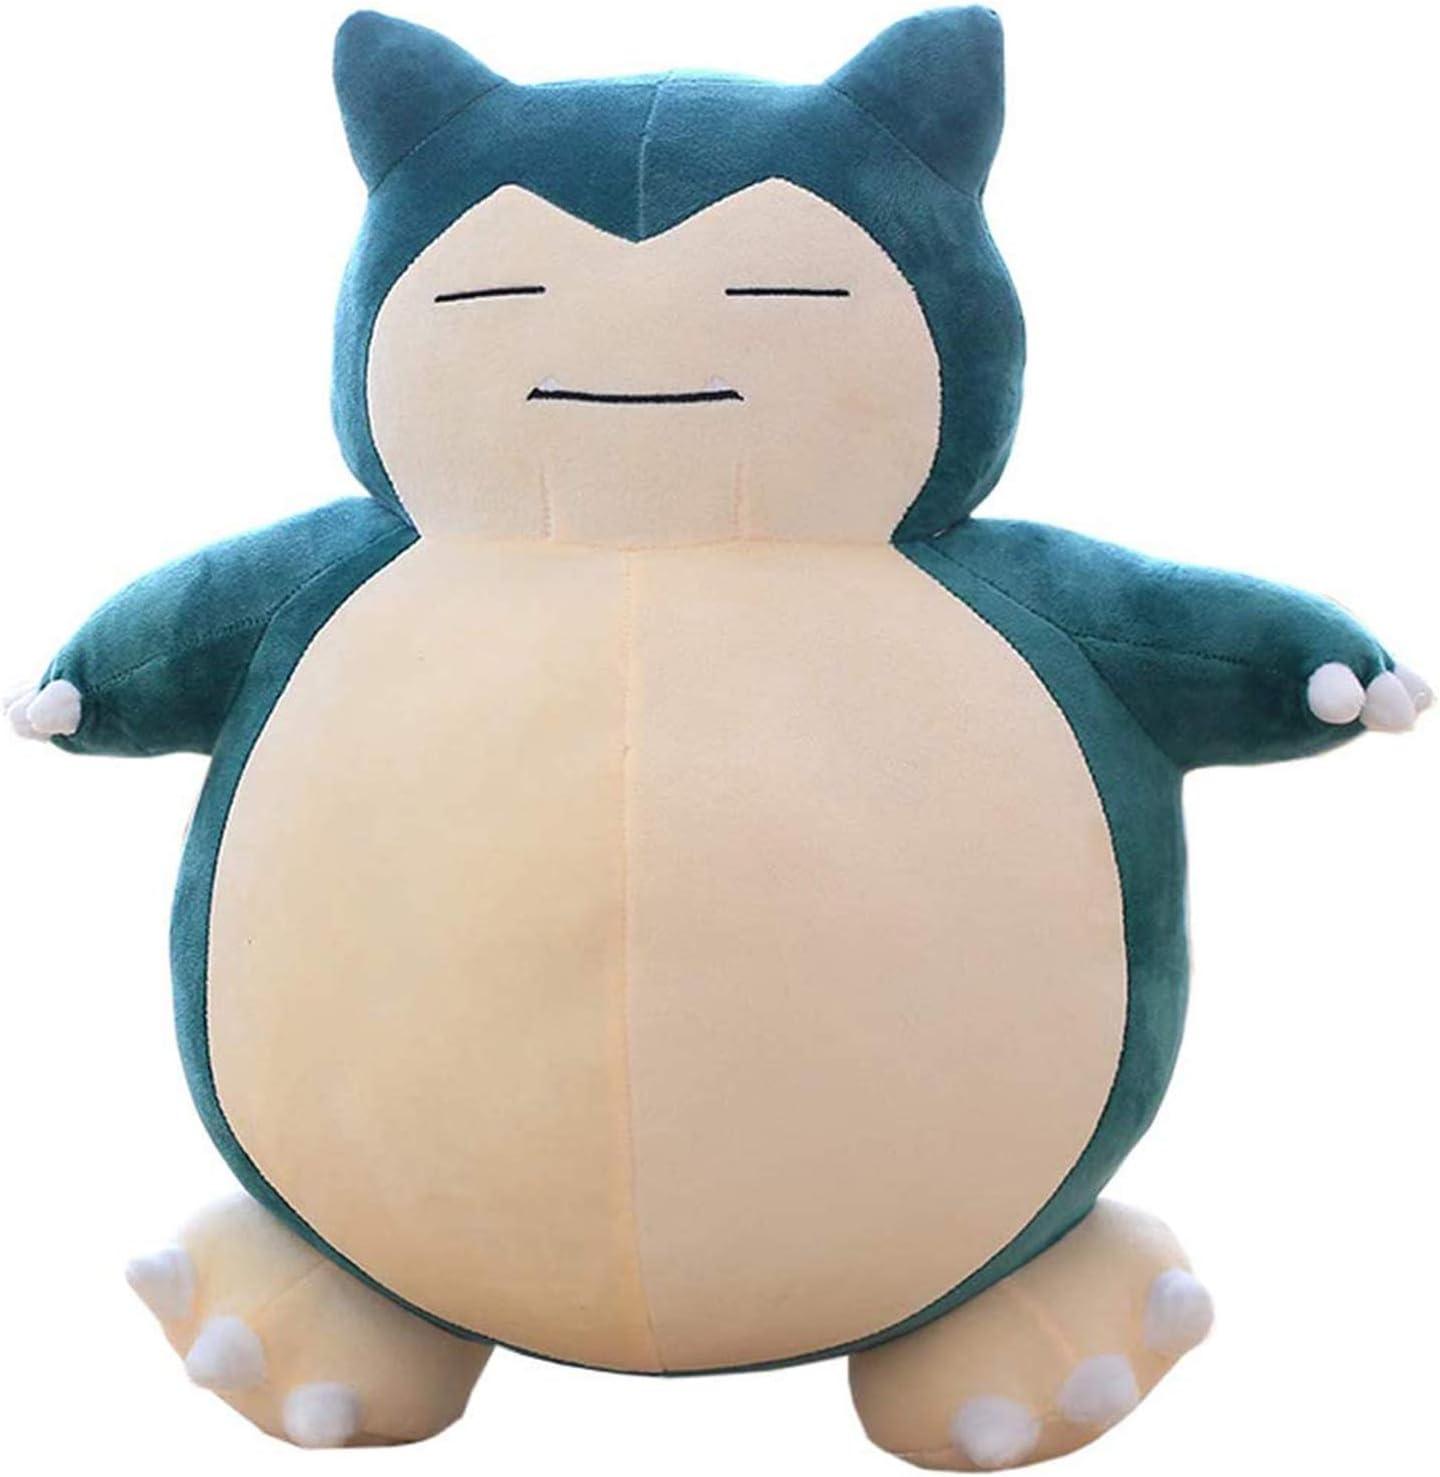 Jumbo Snorlax Soft Kabigon Doll Plush Kid Pillow Brand Cheap Sale Venue Max 87% OFF Toy Body Figure